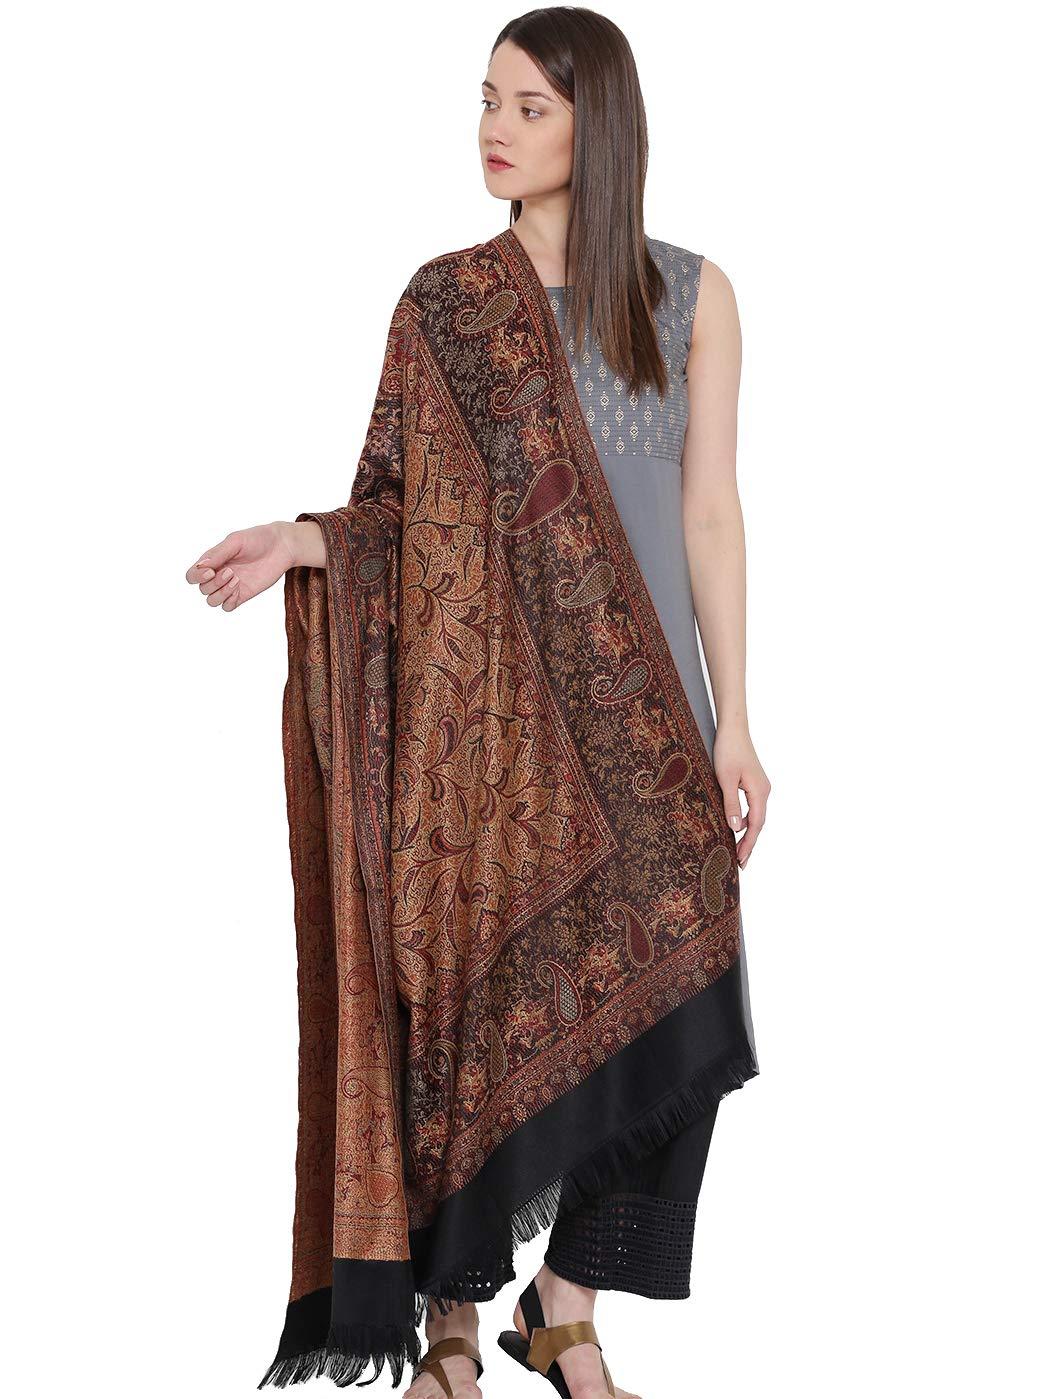 Weavers Villa Women's 100% Pashmina Wool Indian Handicraft Woven Shawls, Scarf and Wraps [Large Size: 40'' X 80'']